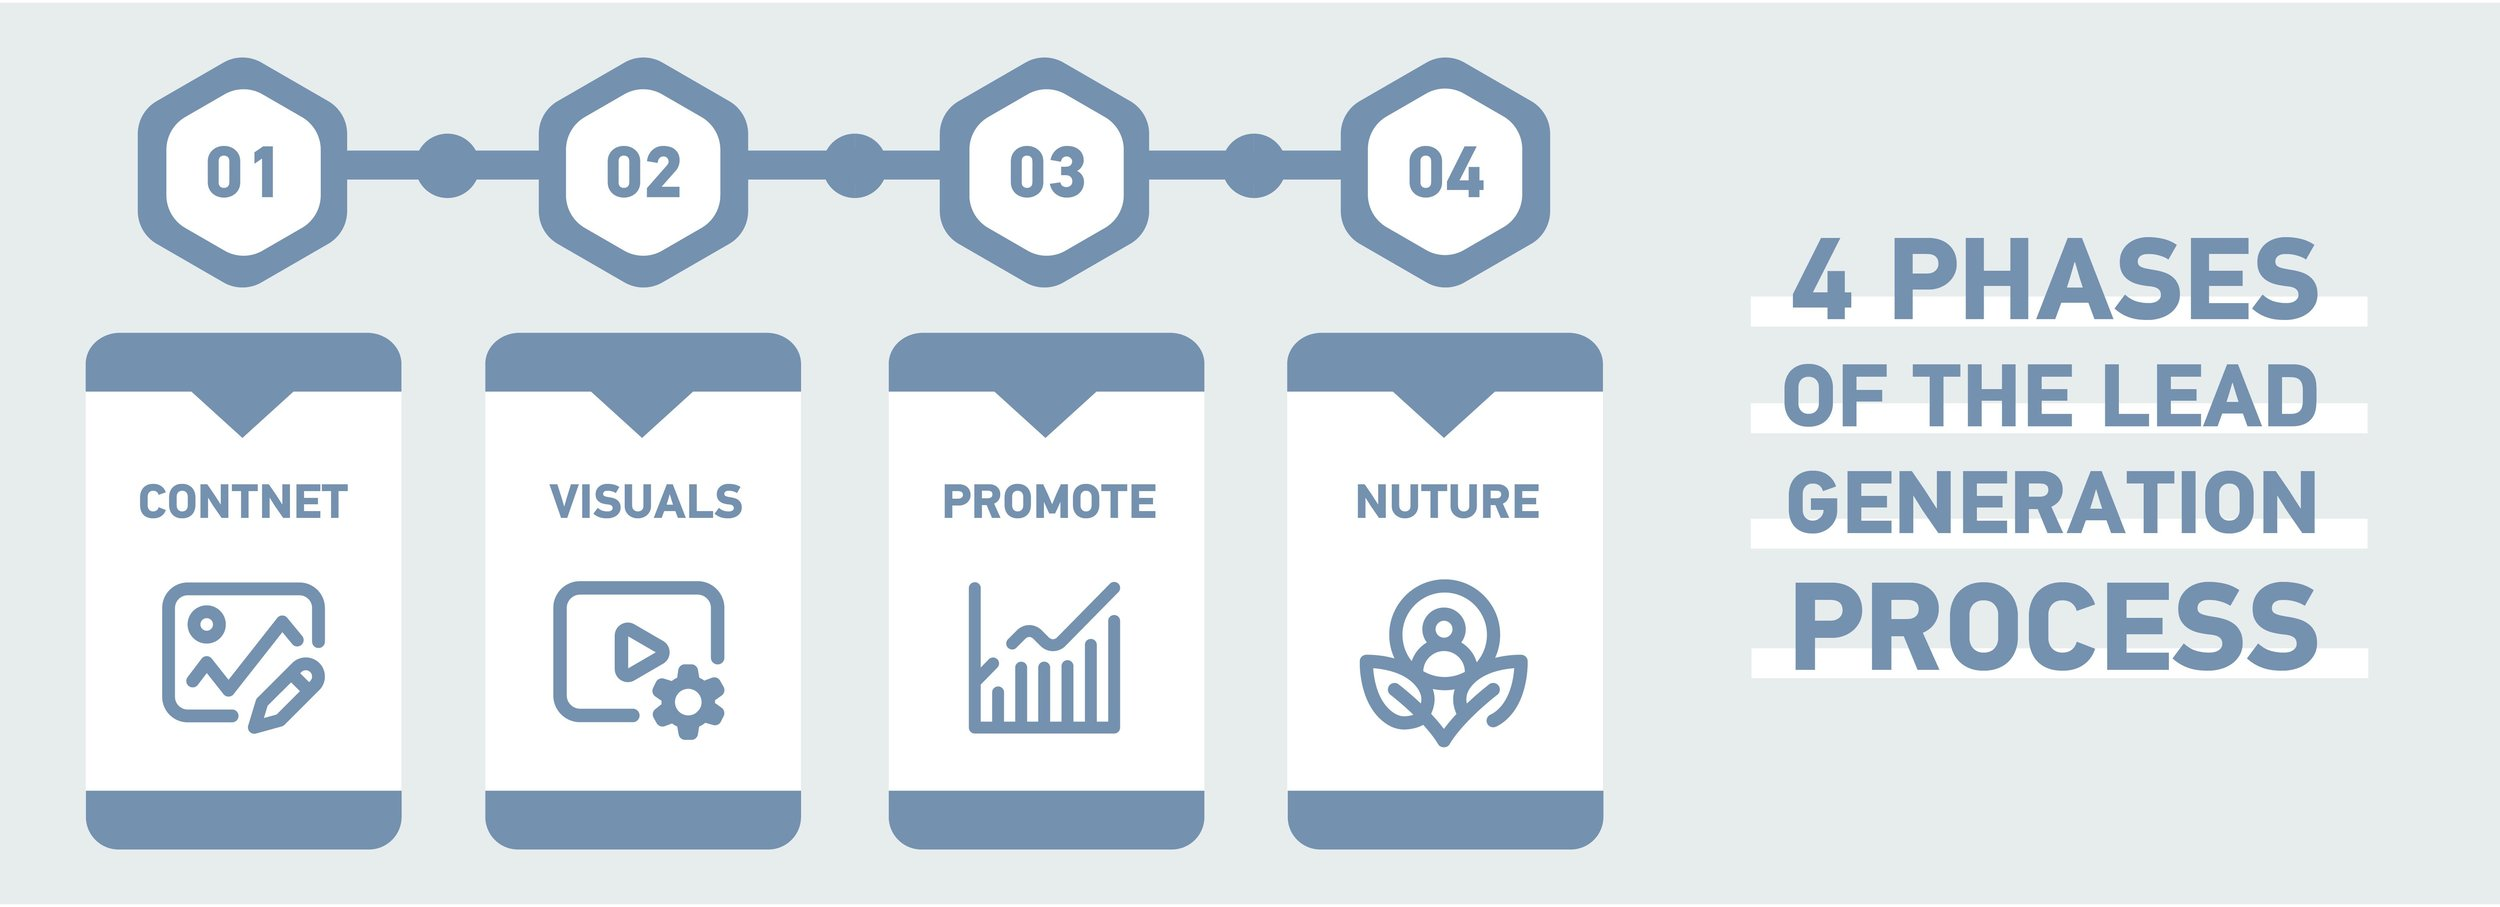 Lead Generation Process Diagram